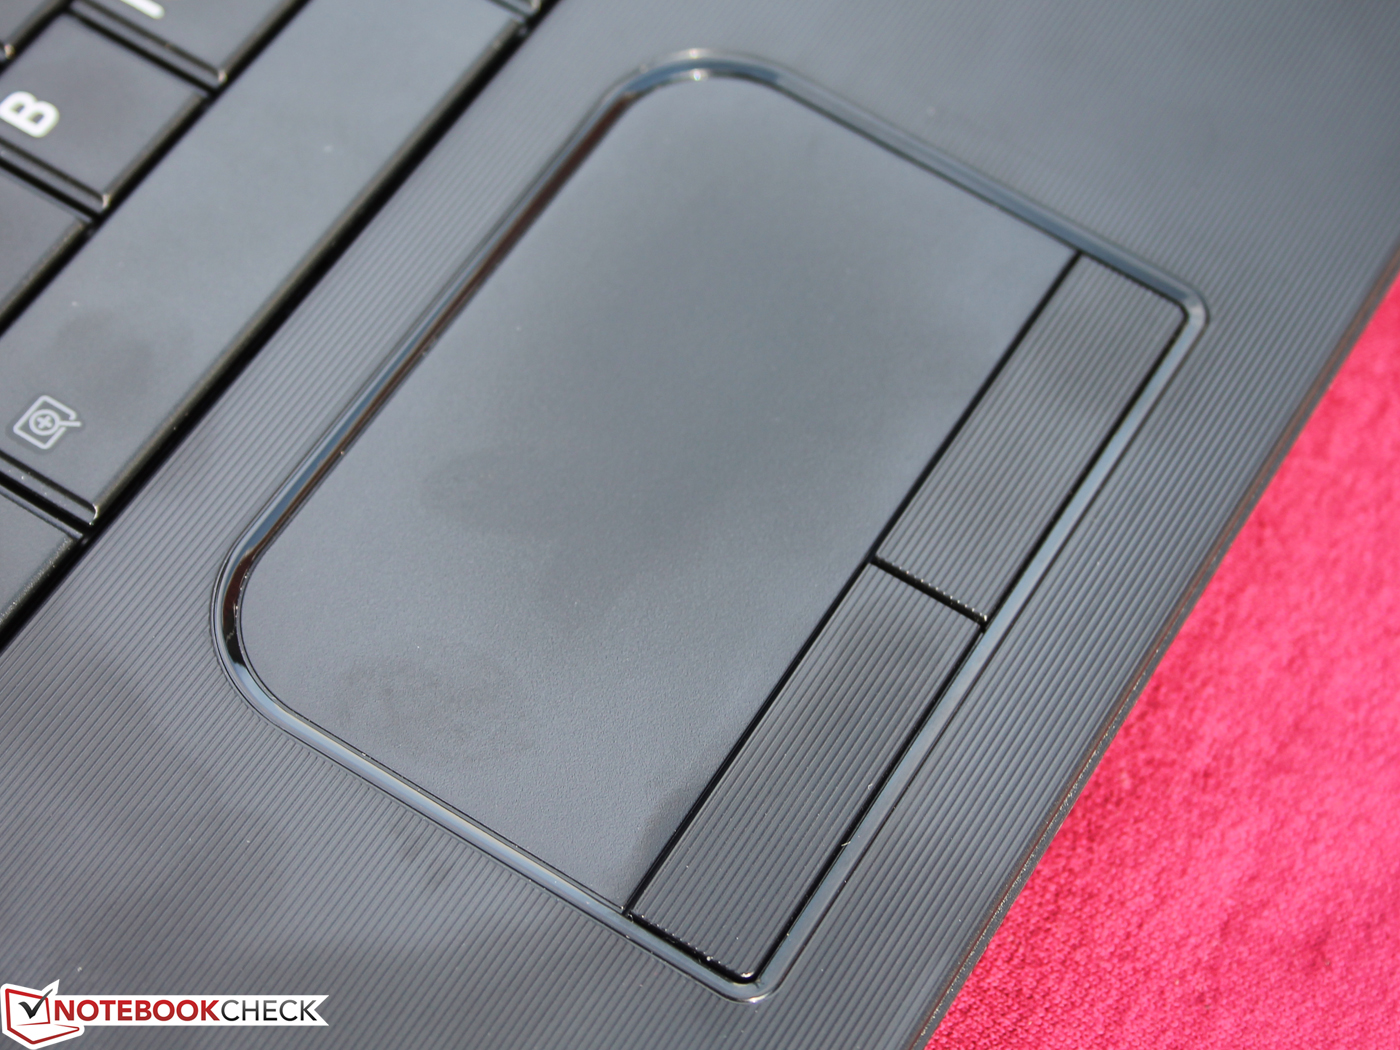 TOSHIBA TECRA A50-A ALPS TOUCHPAD DRIVER FOR WINDOWS 8